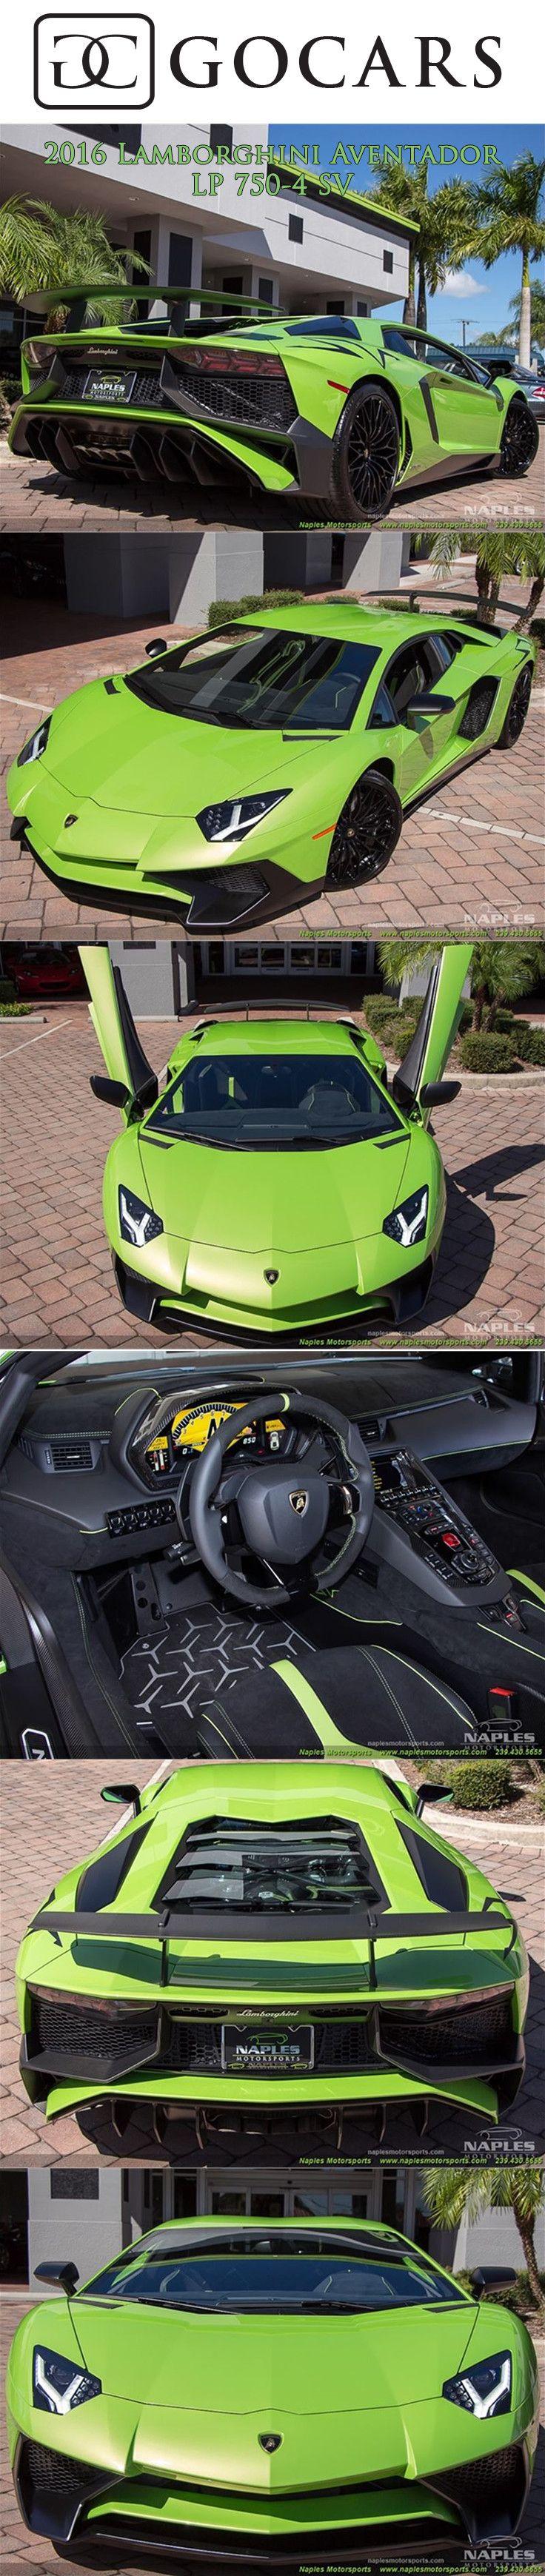 2016 Lamborghini Aventador LP 750-4 SV for sale on GoCars #lamborghini #aventador #lamborghiniaventador #lambo #lamborghiniaventadorlp700 #supercars #supercar #sportscars #sportscar #luxury #luxurycars #lamborghiniphotos #gocars